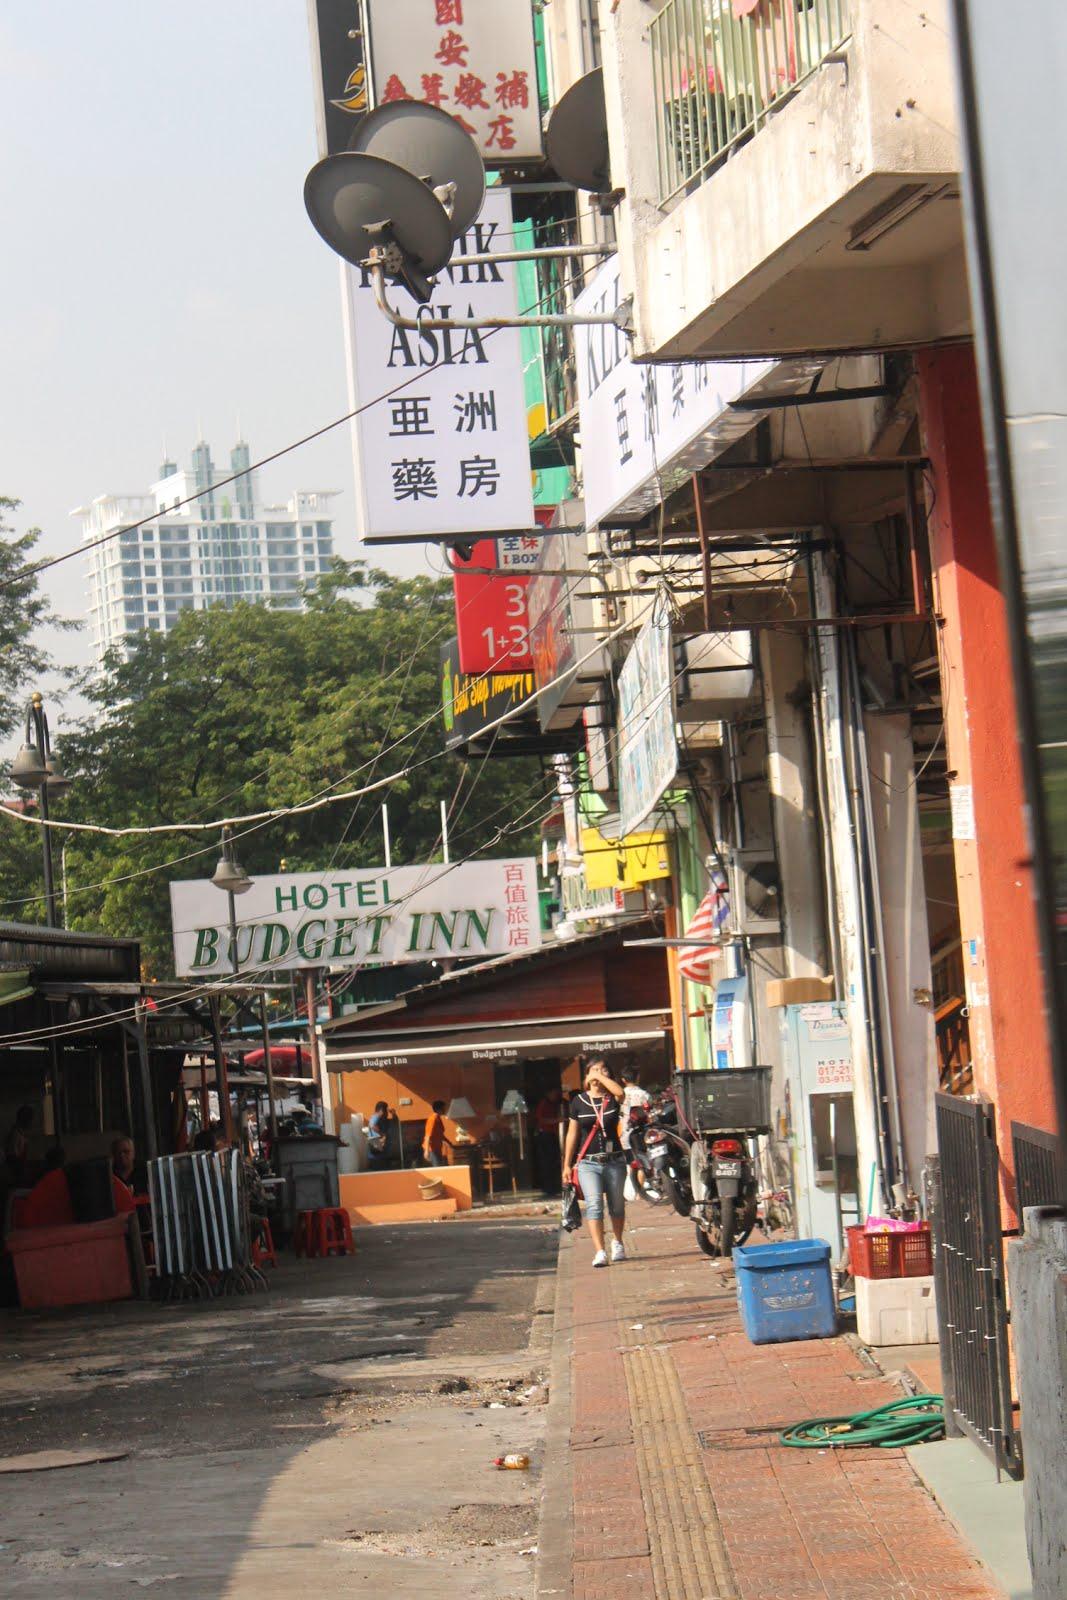 Liburan Murah dan Wisata Ke Kuala Lumpur, Malaysia - Ayok melalak on